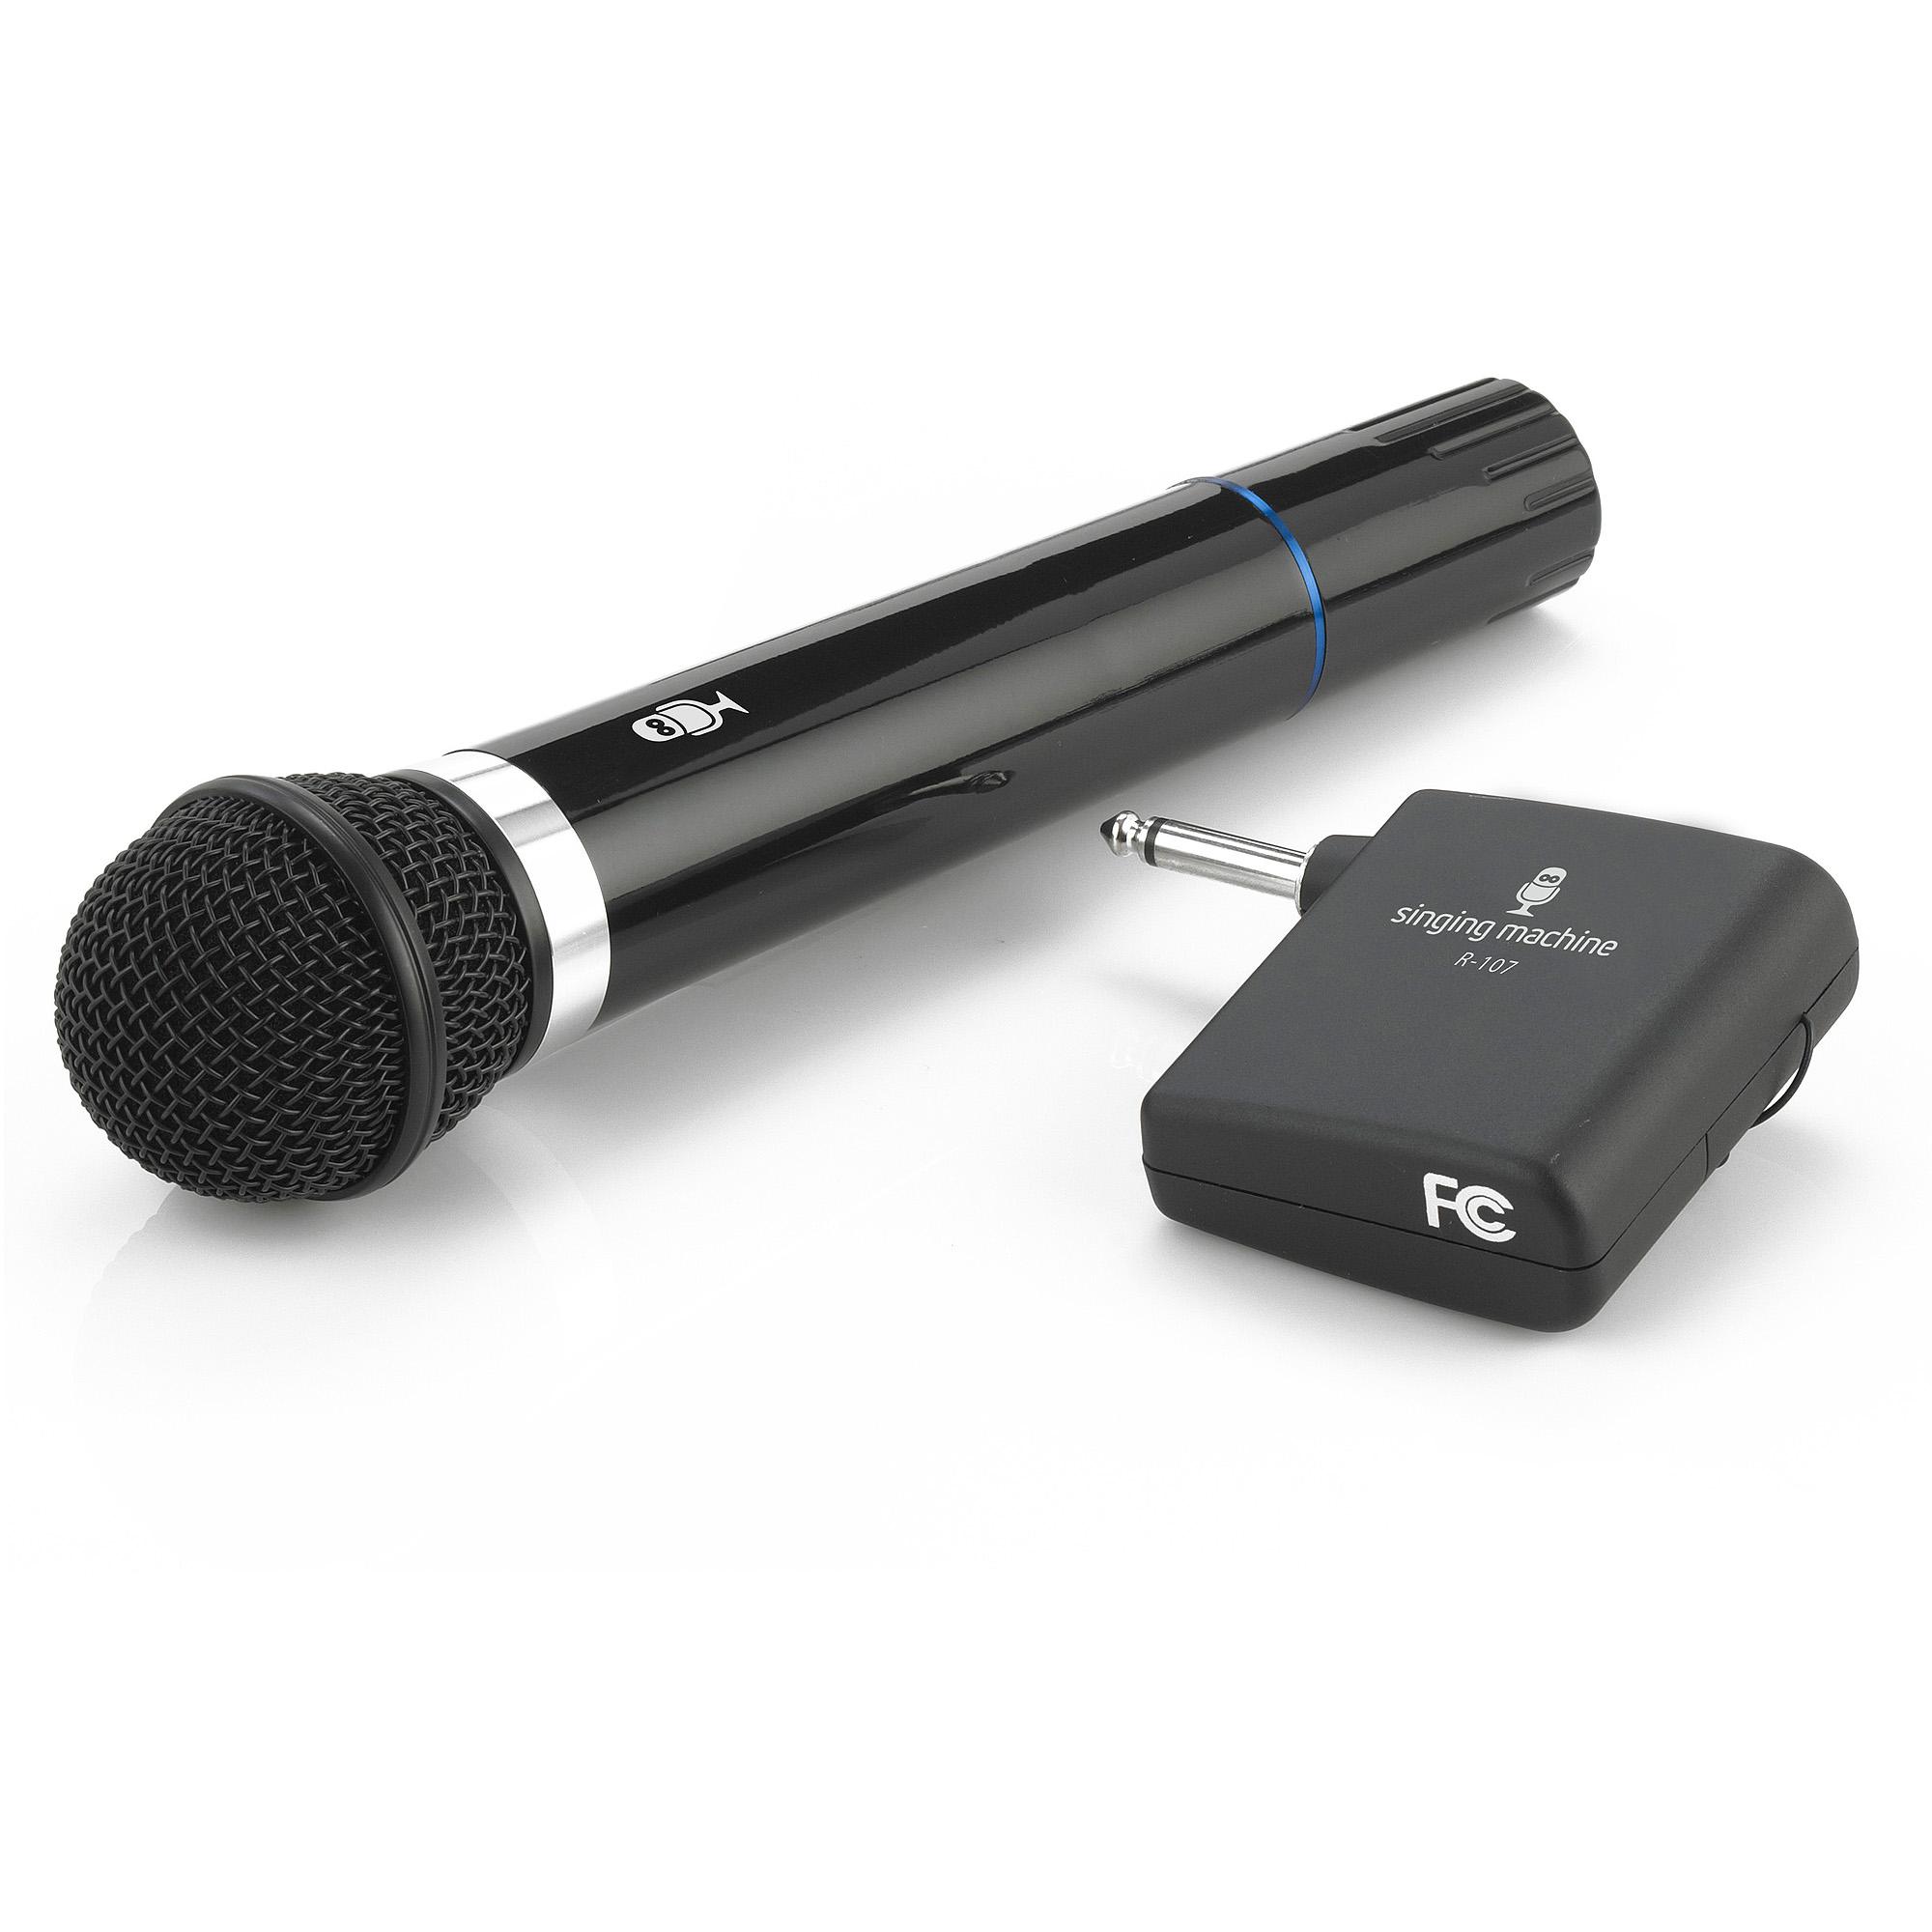 Singing Machine SMM107 Wireless Uni-Directional Dynamic Microphone